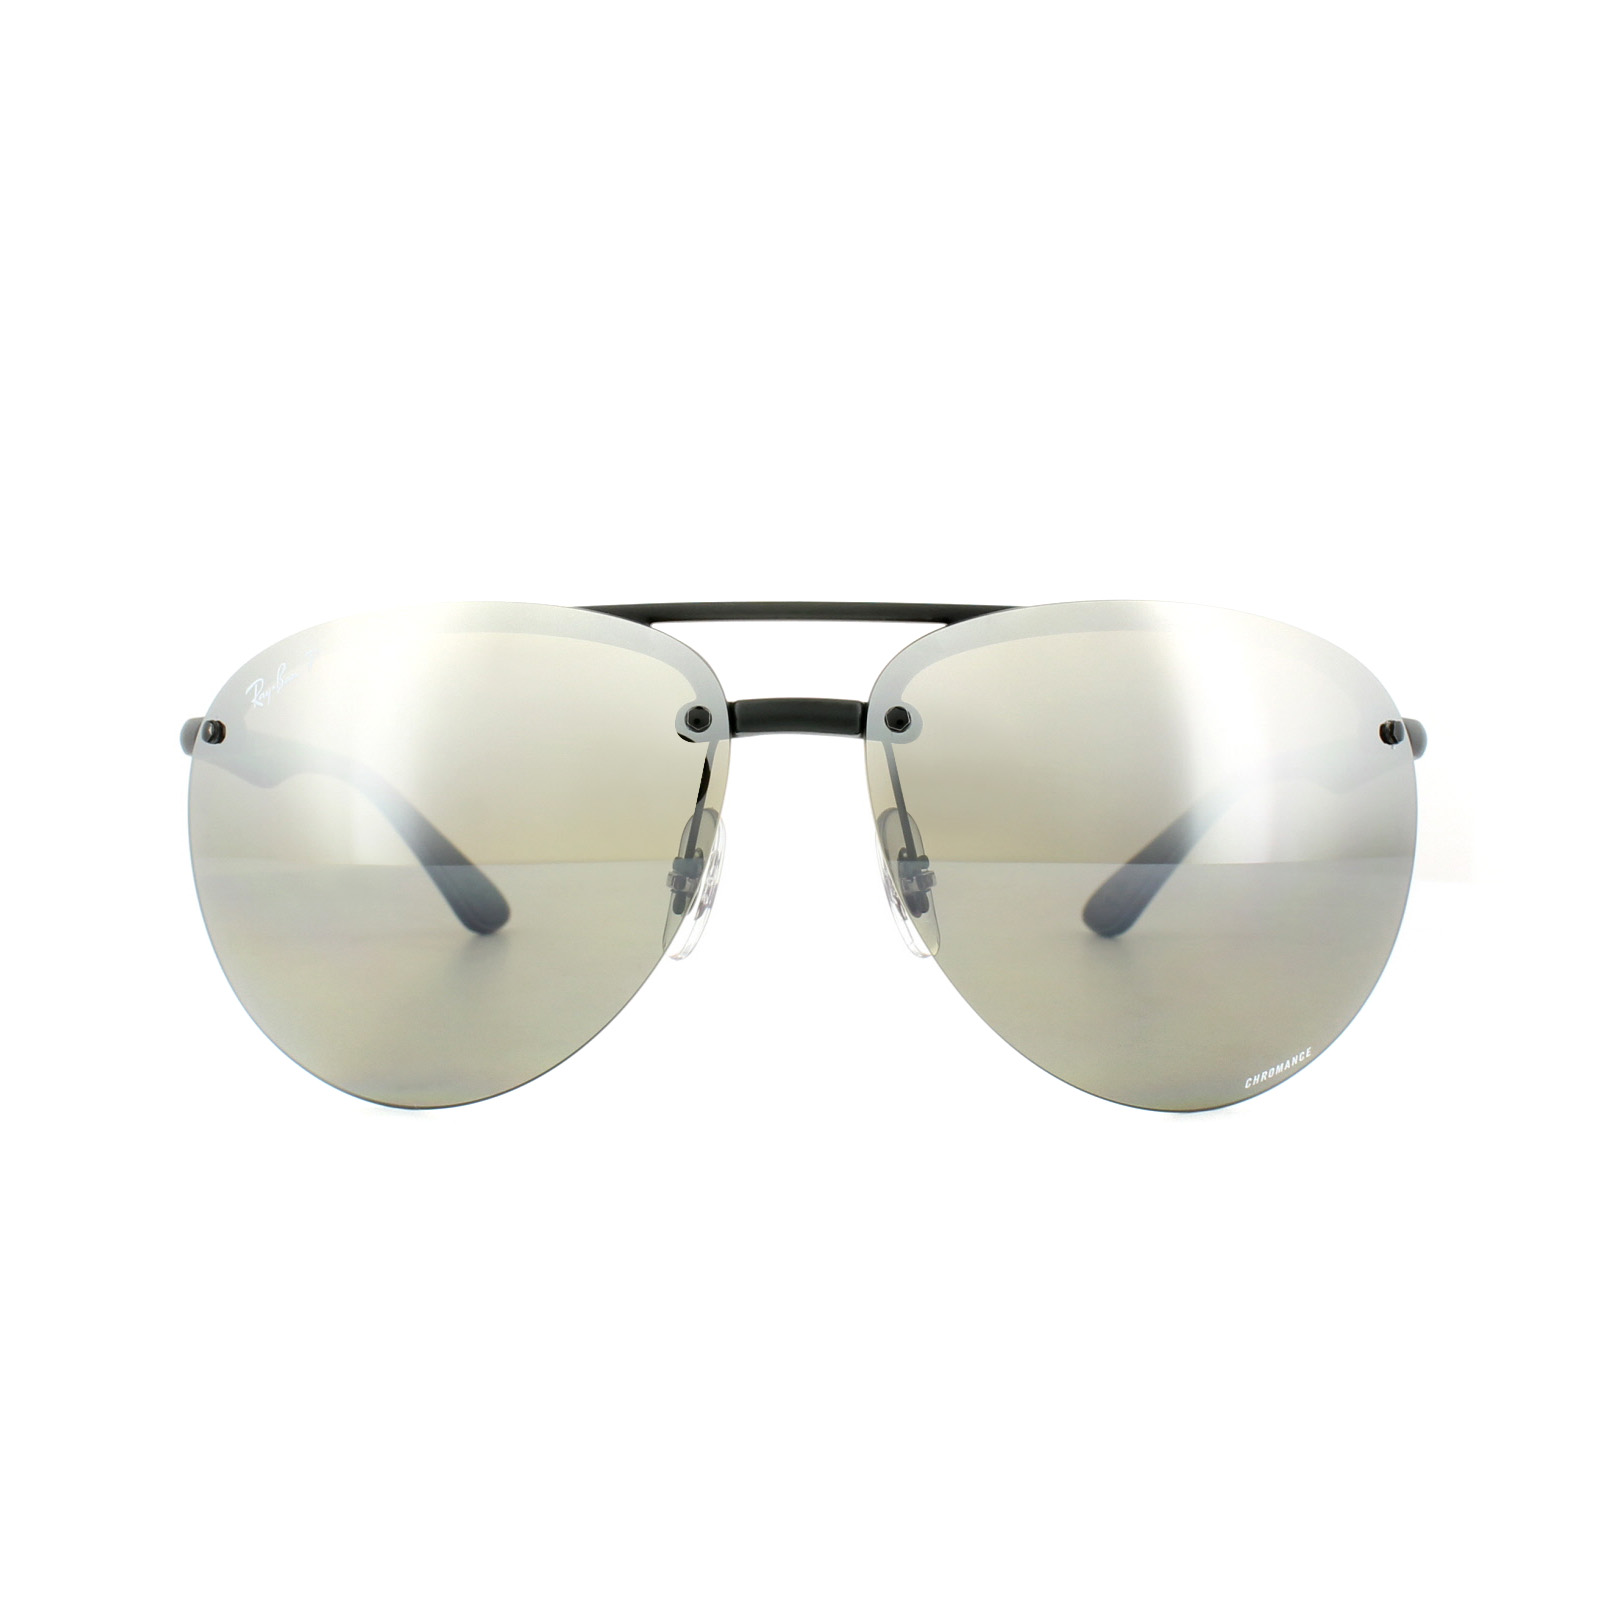 96c6f2b75d Sentinel Ray-Ban Sunglasses 4293CH 601S5J Black Polarized Silver Mirror  Chromance